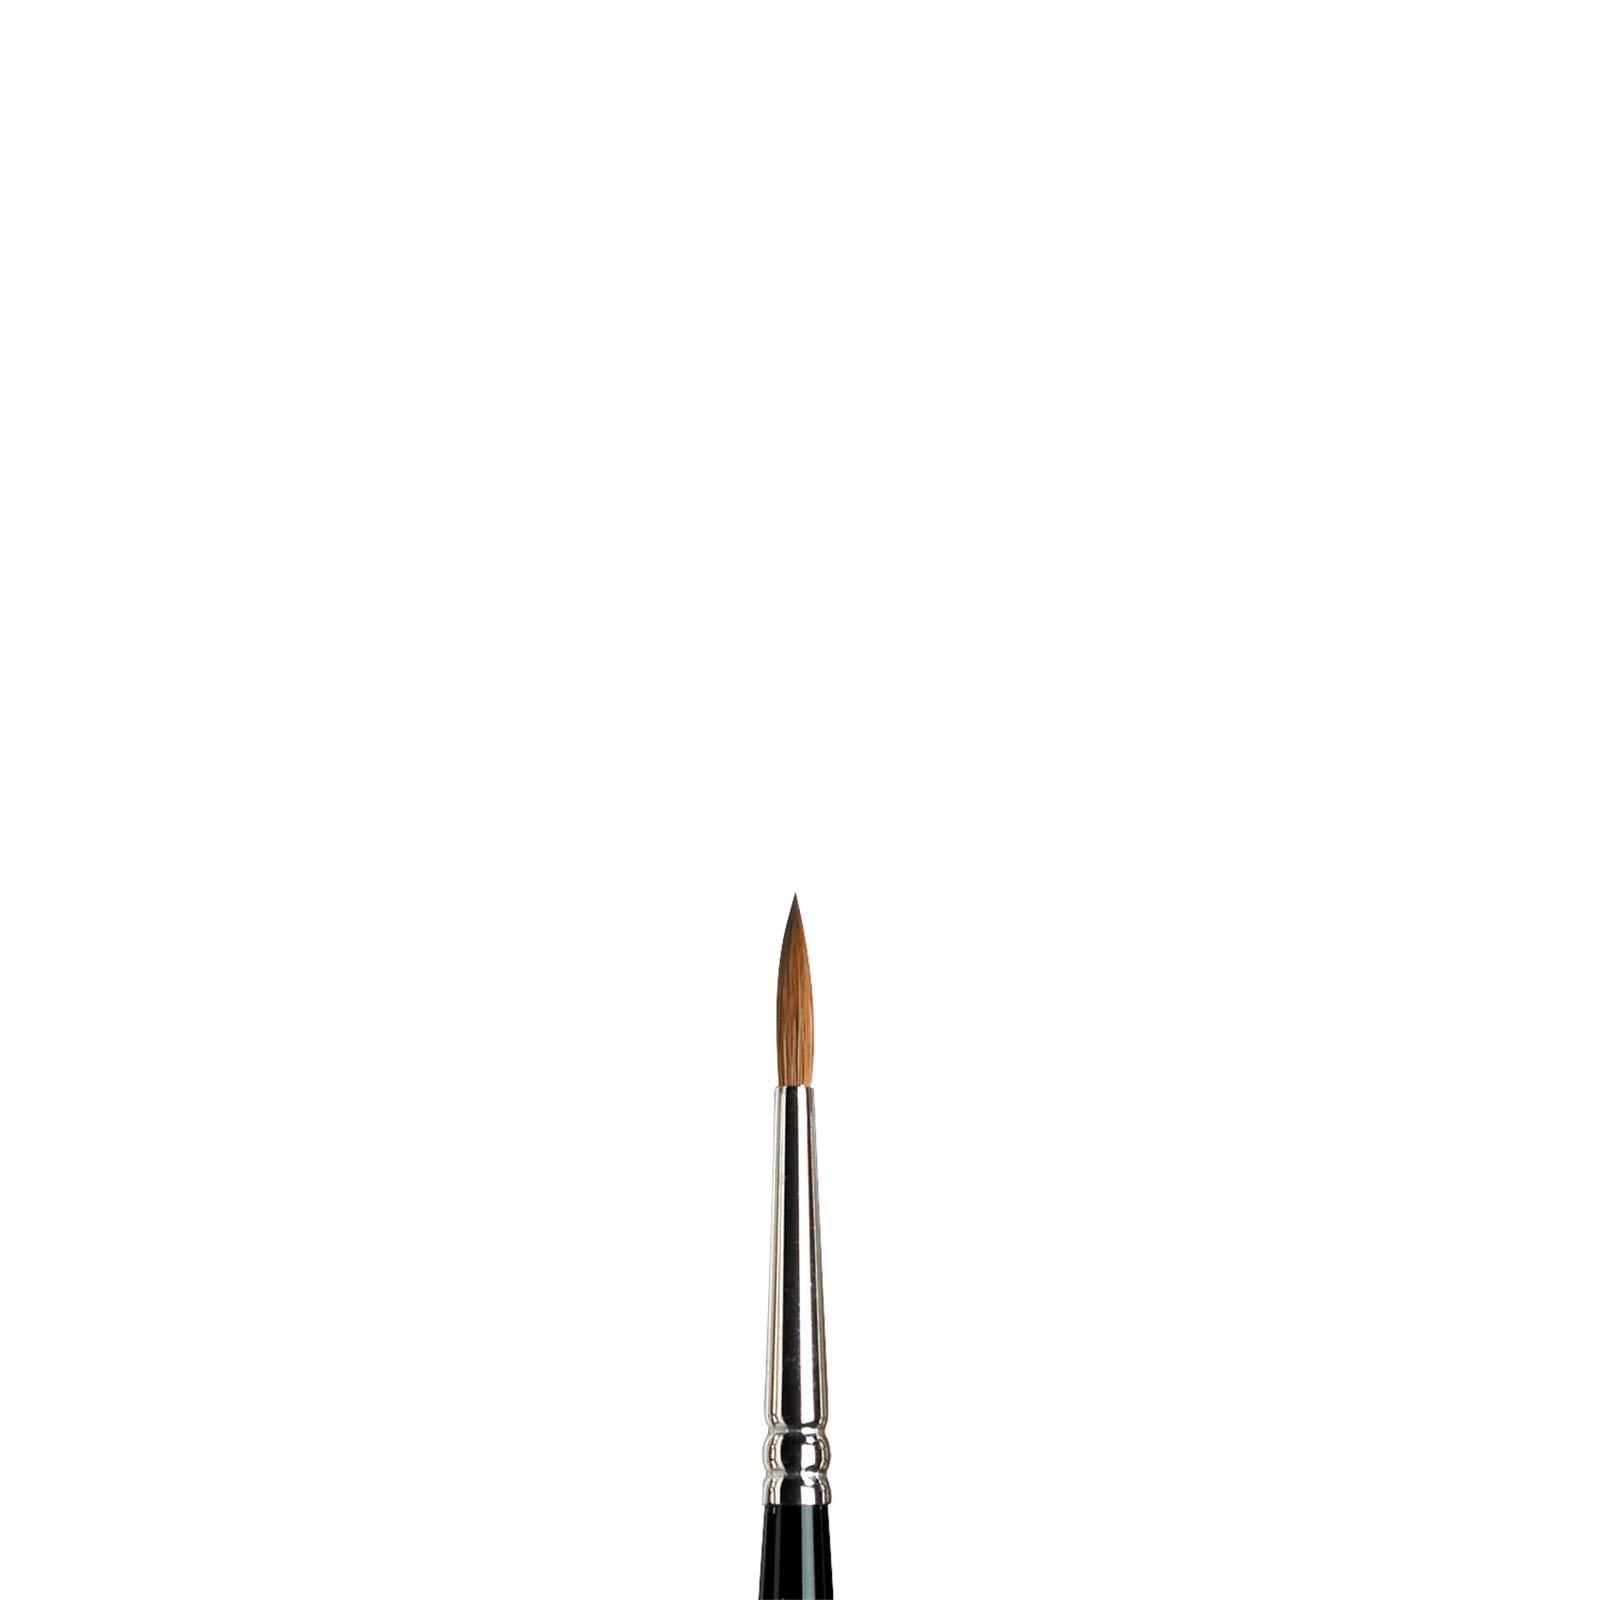 Winsor & Newton Series 7 Kolinsky Sable Watercolor Brush - Round #3